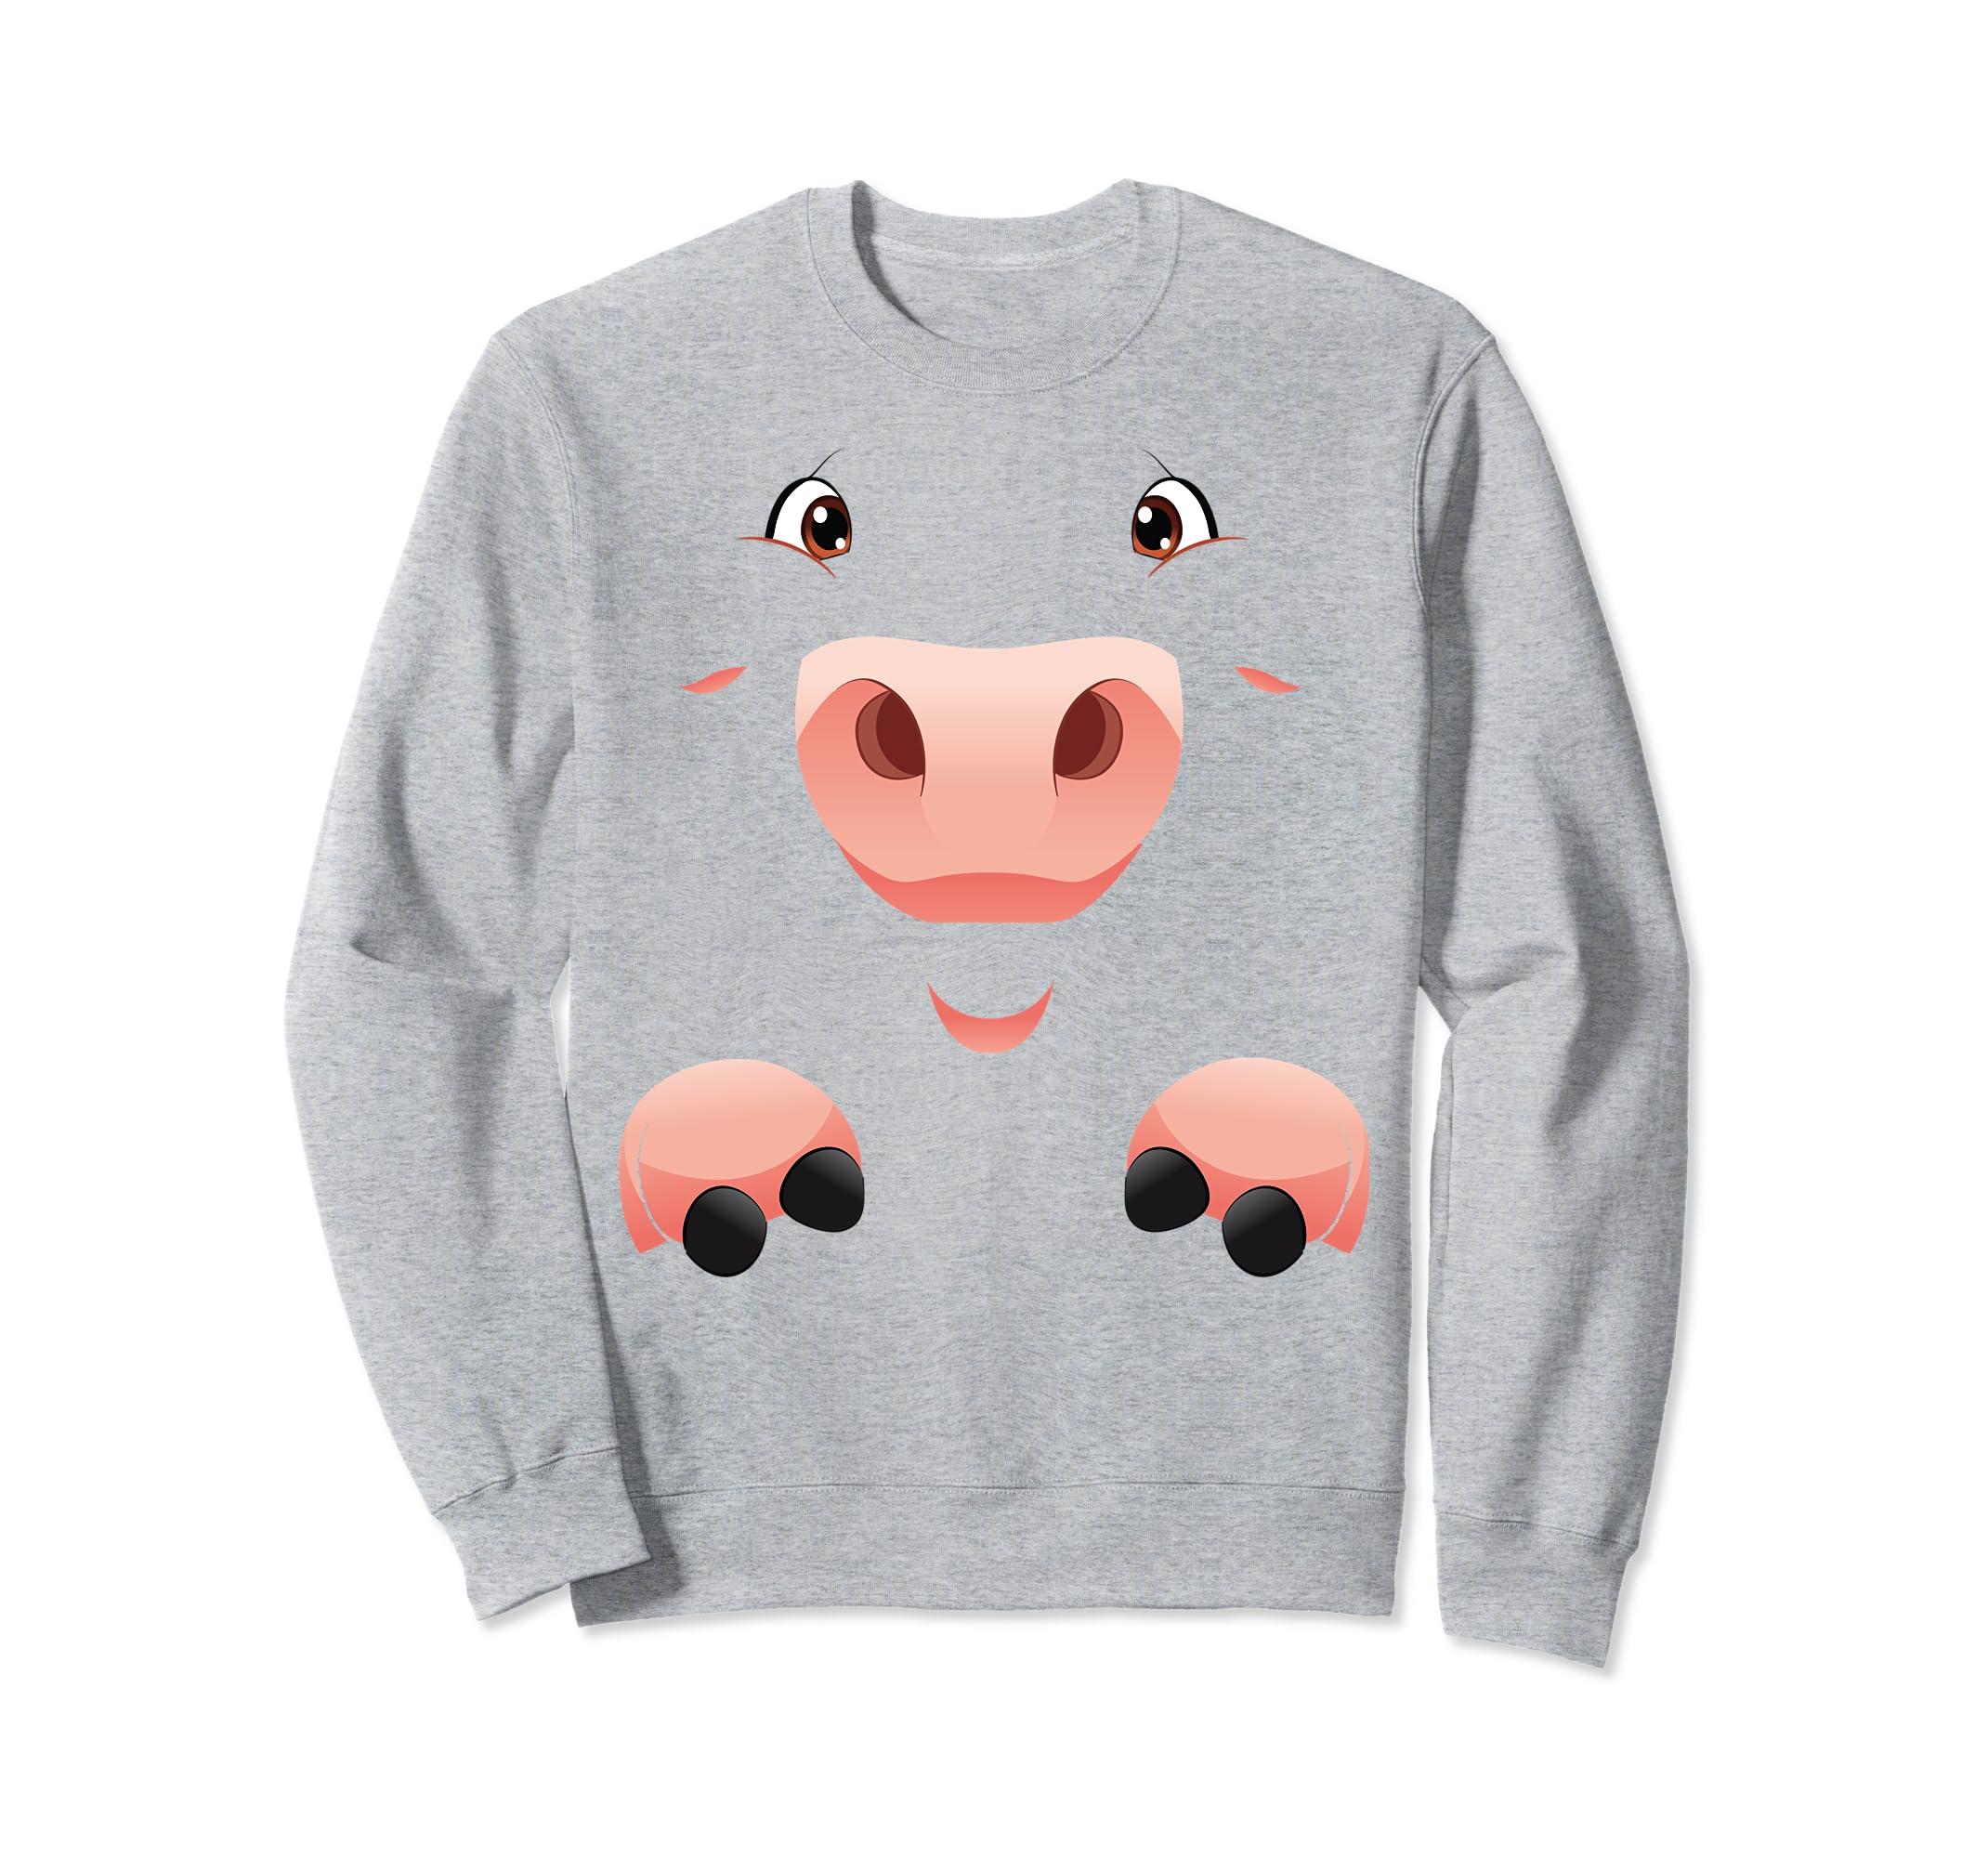 Funny Halloween Sweatshirt Fun Simple Cute Pig Costume-Rose